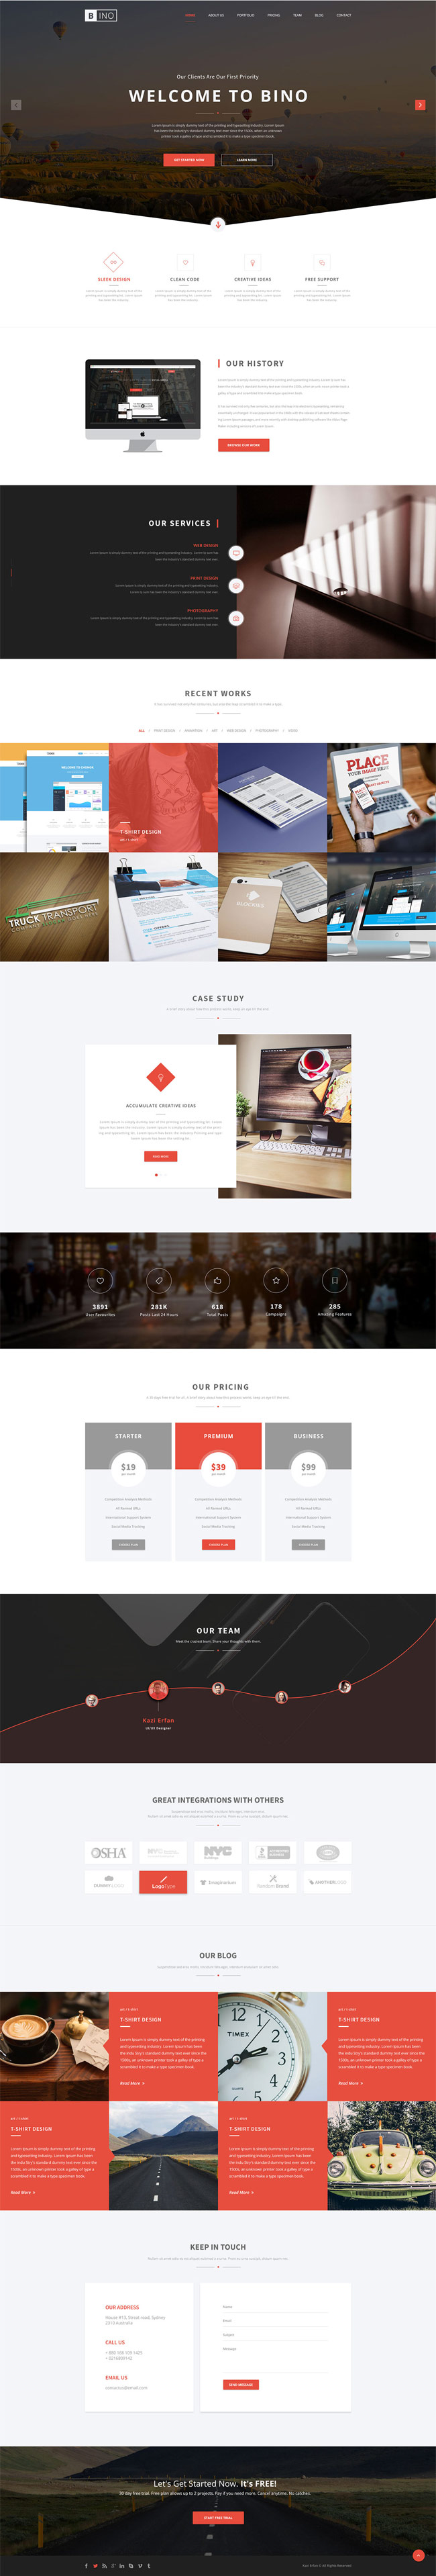 Bino - Free Landing Page PSD Template